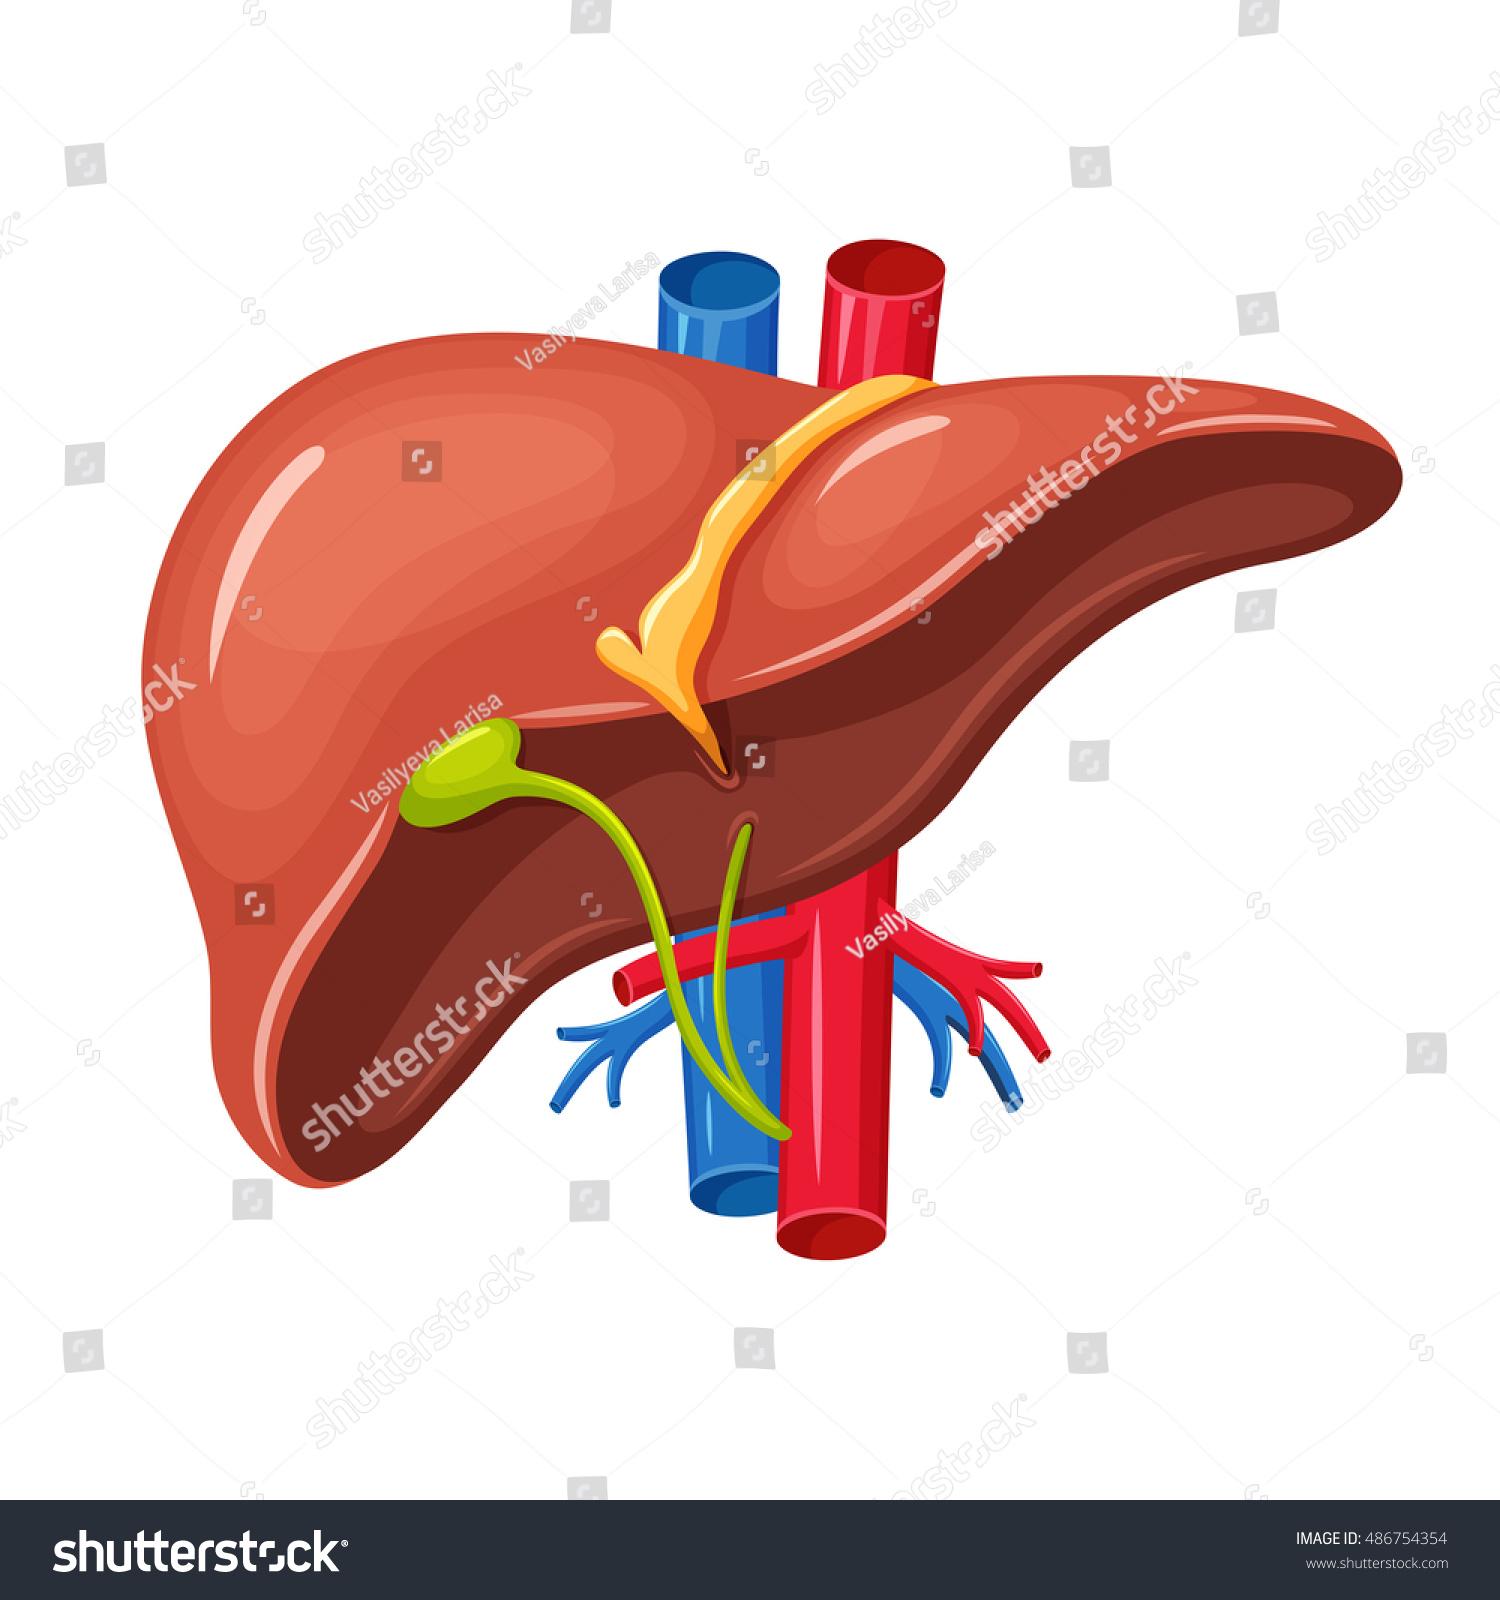 Human Liver Anatomy Medical Science Illustration Stock Illustration ...